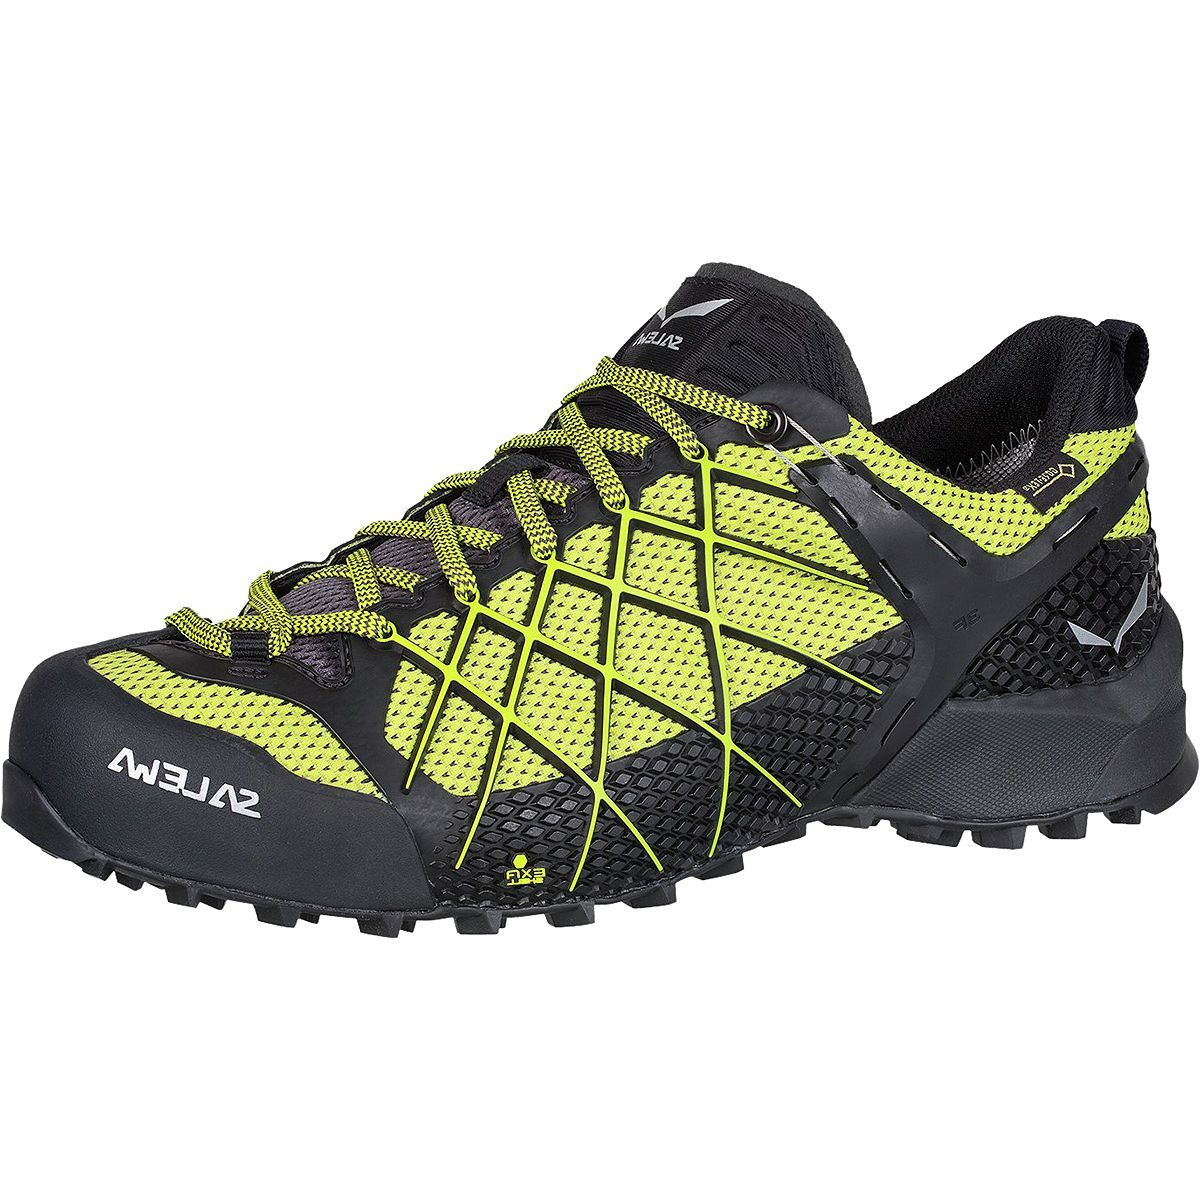 Salewa Wildfire GTX Hiking Shoe - Men's